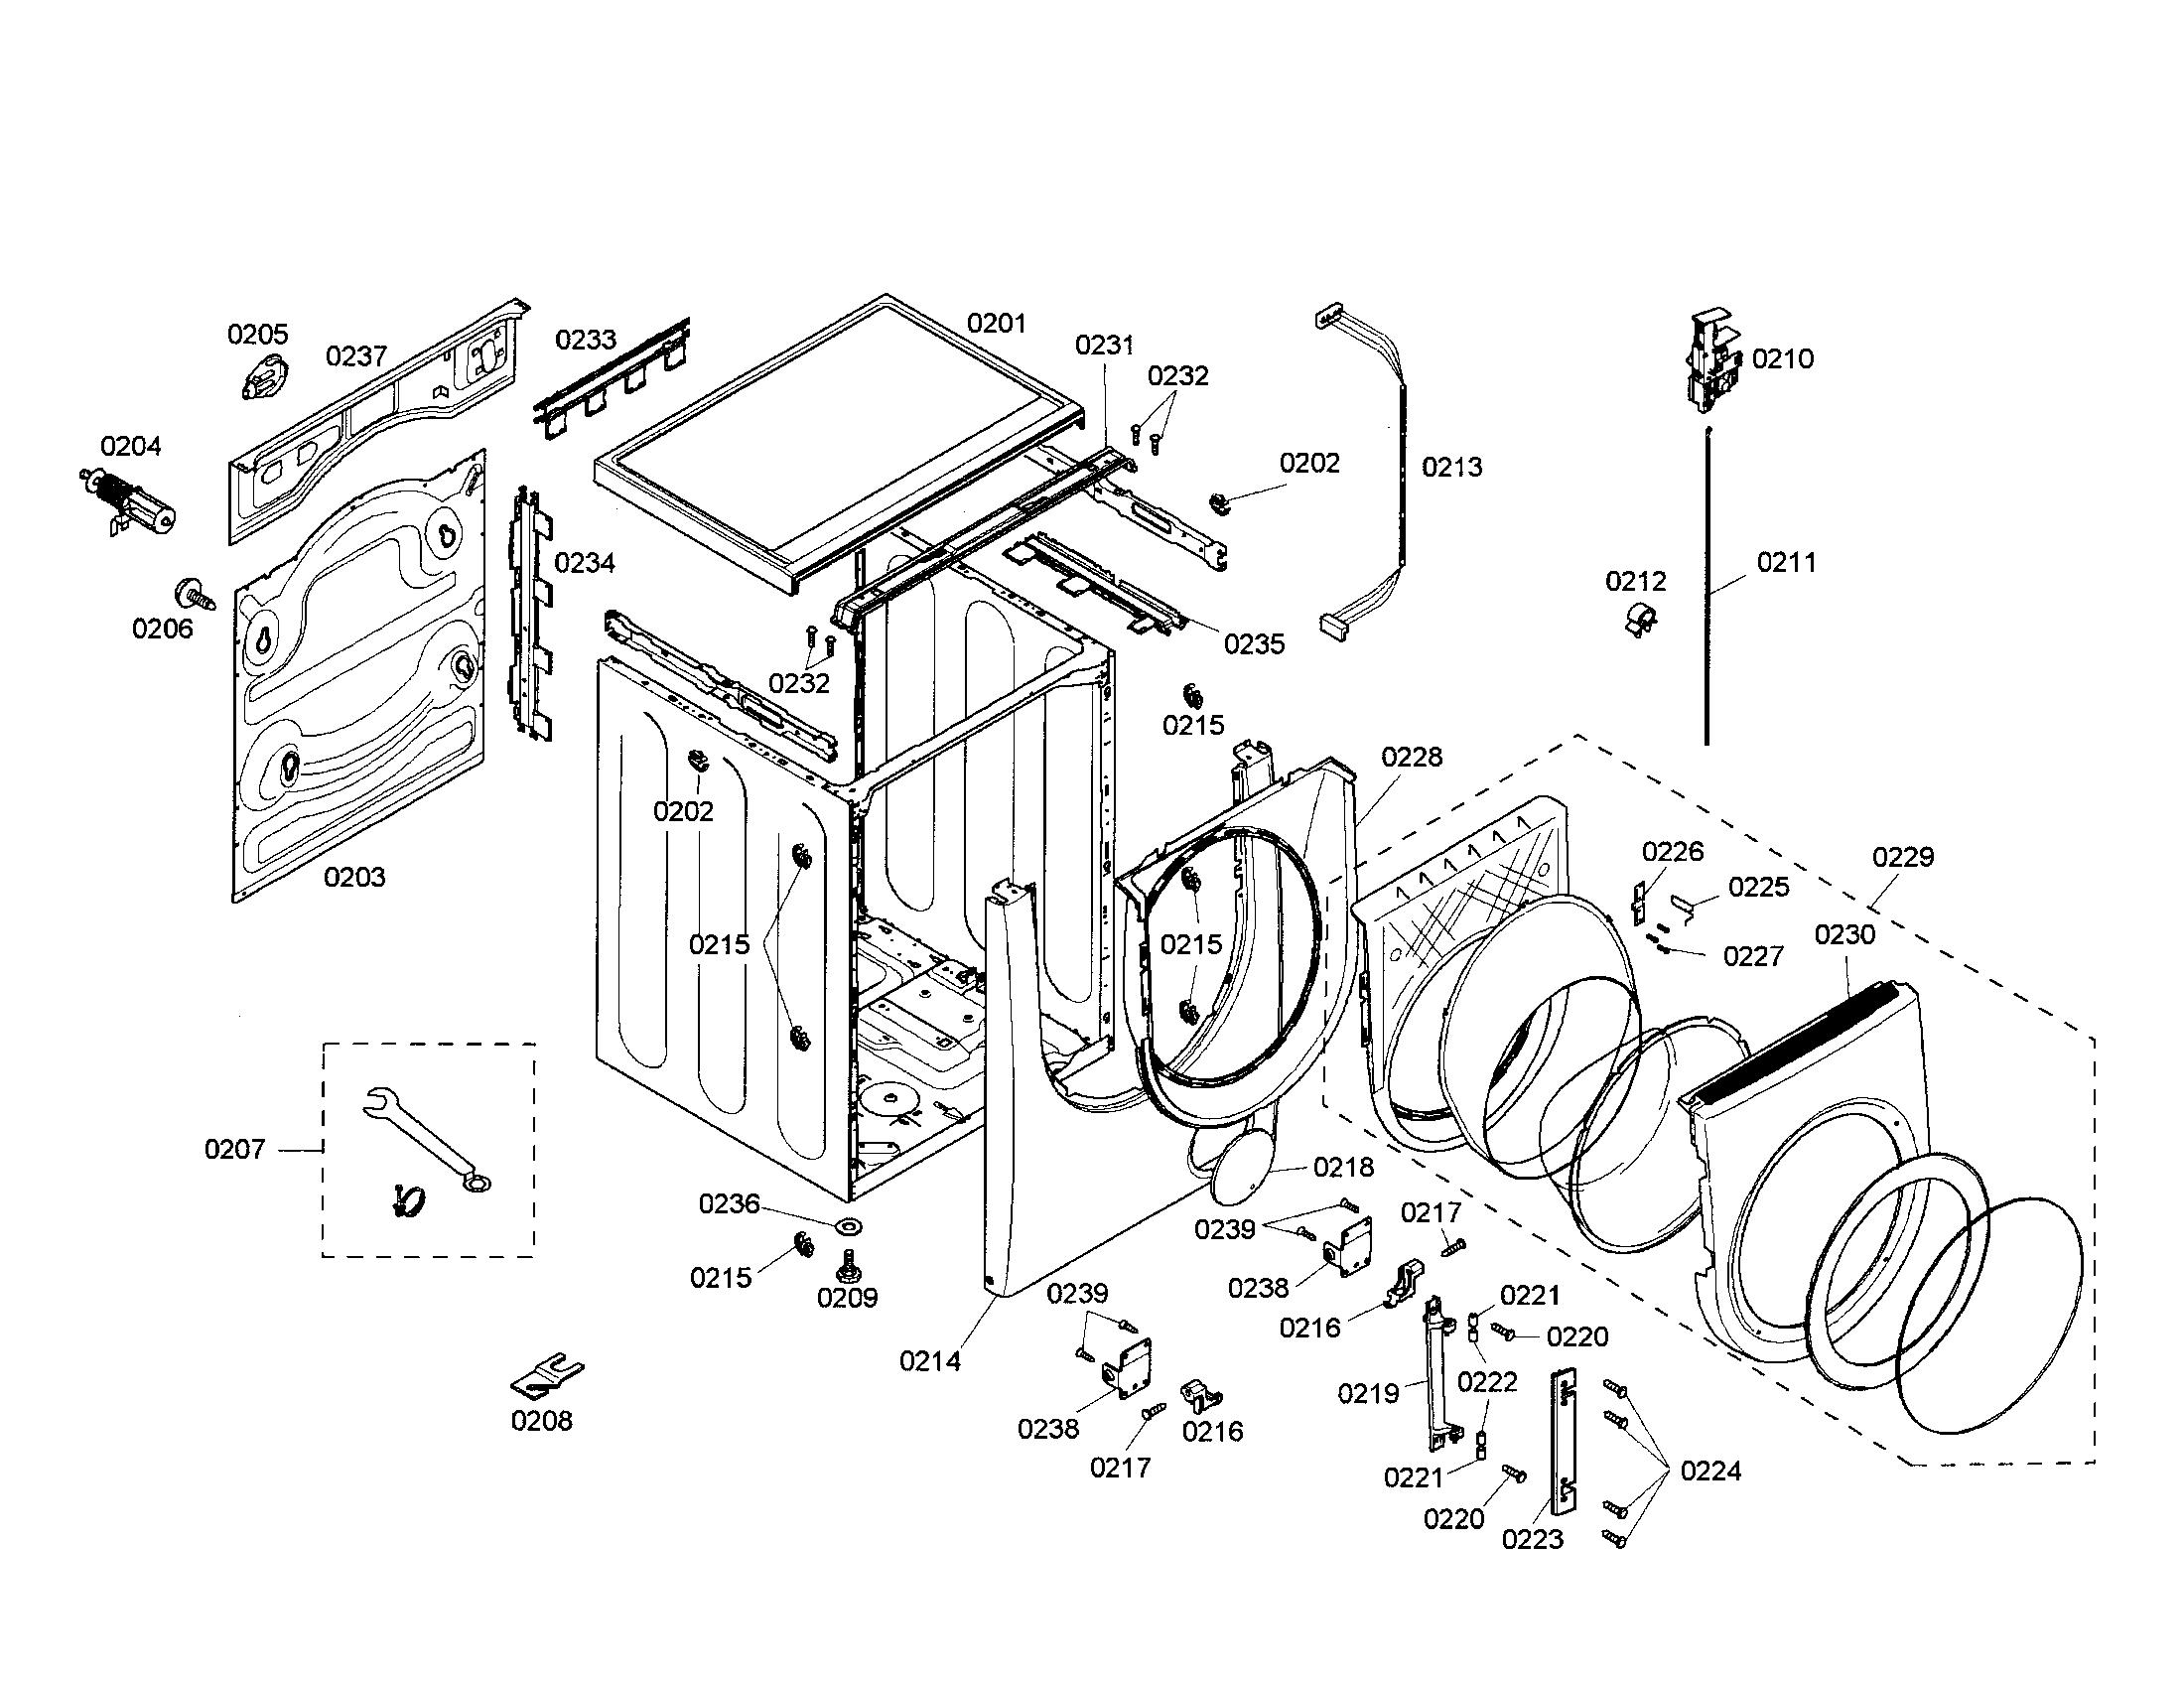 Dh 3781 Bosch Washer Wiring Diagram Free Diagram